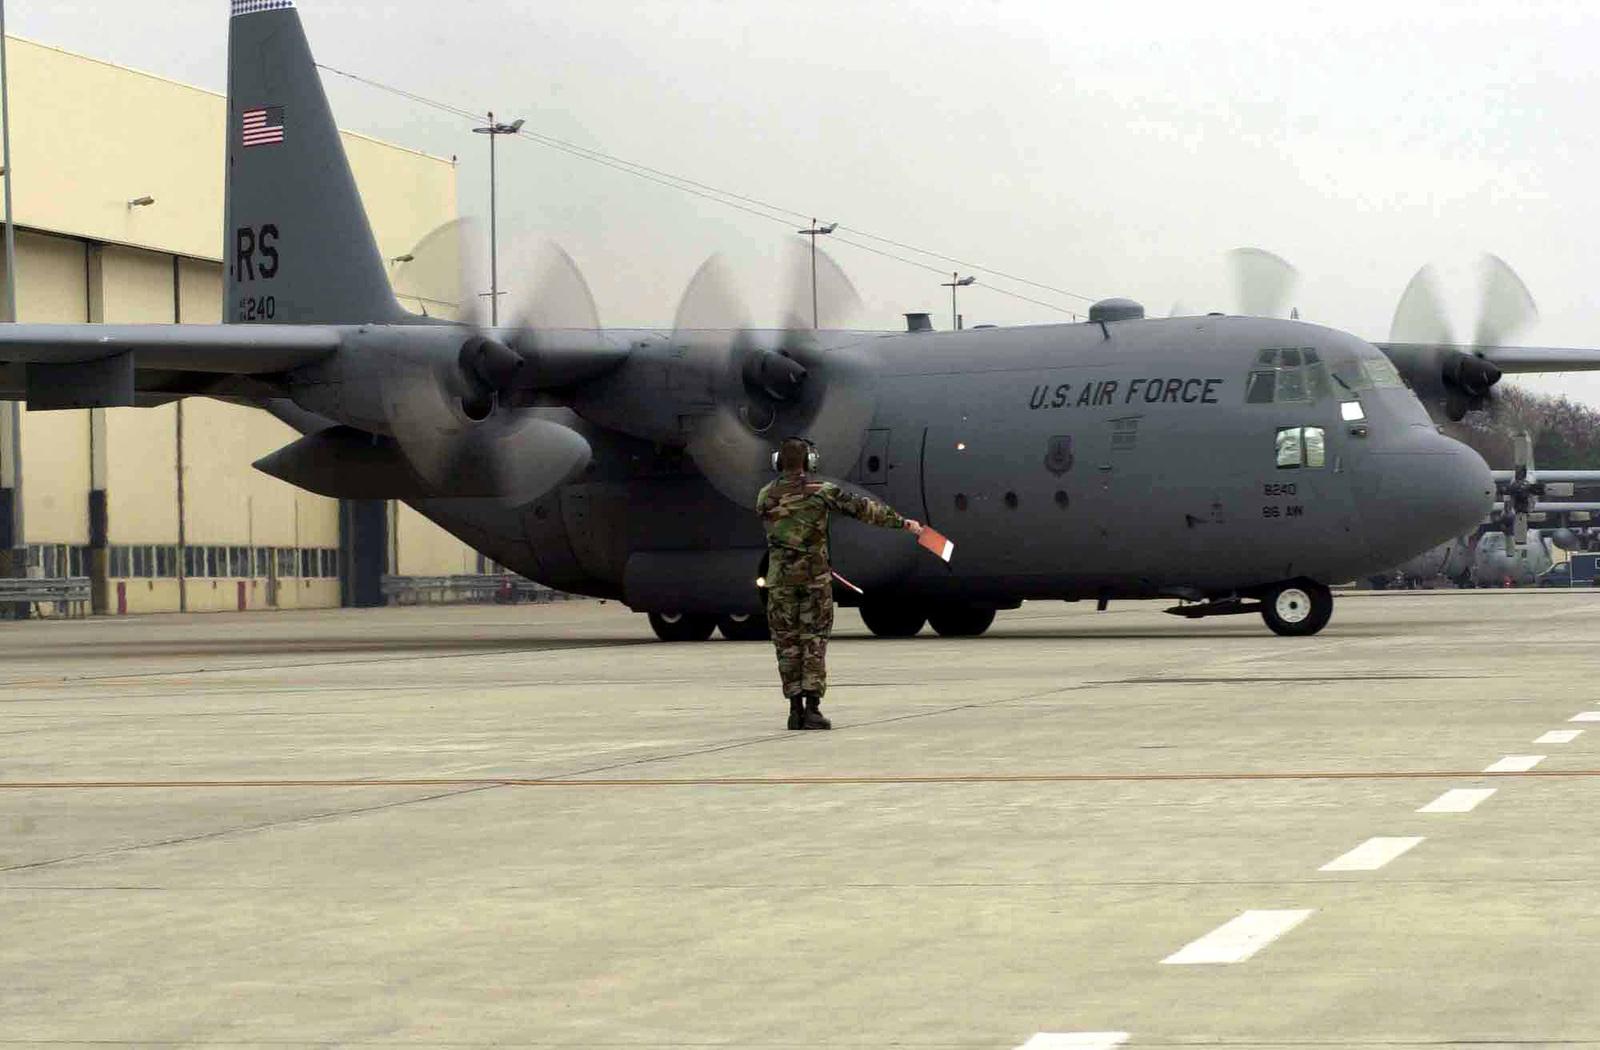 US Air Force (USAF) SENIOR AIRMAN (SRA) Jordan King, 86th Maintenance Squadron, 86th Airlift Wing, marshals a USAF C-130 Hercules aircraft onto the runway at Ramstein Air Base (AB), Germany